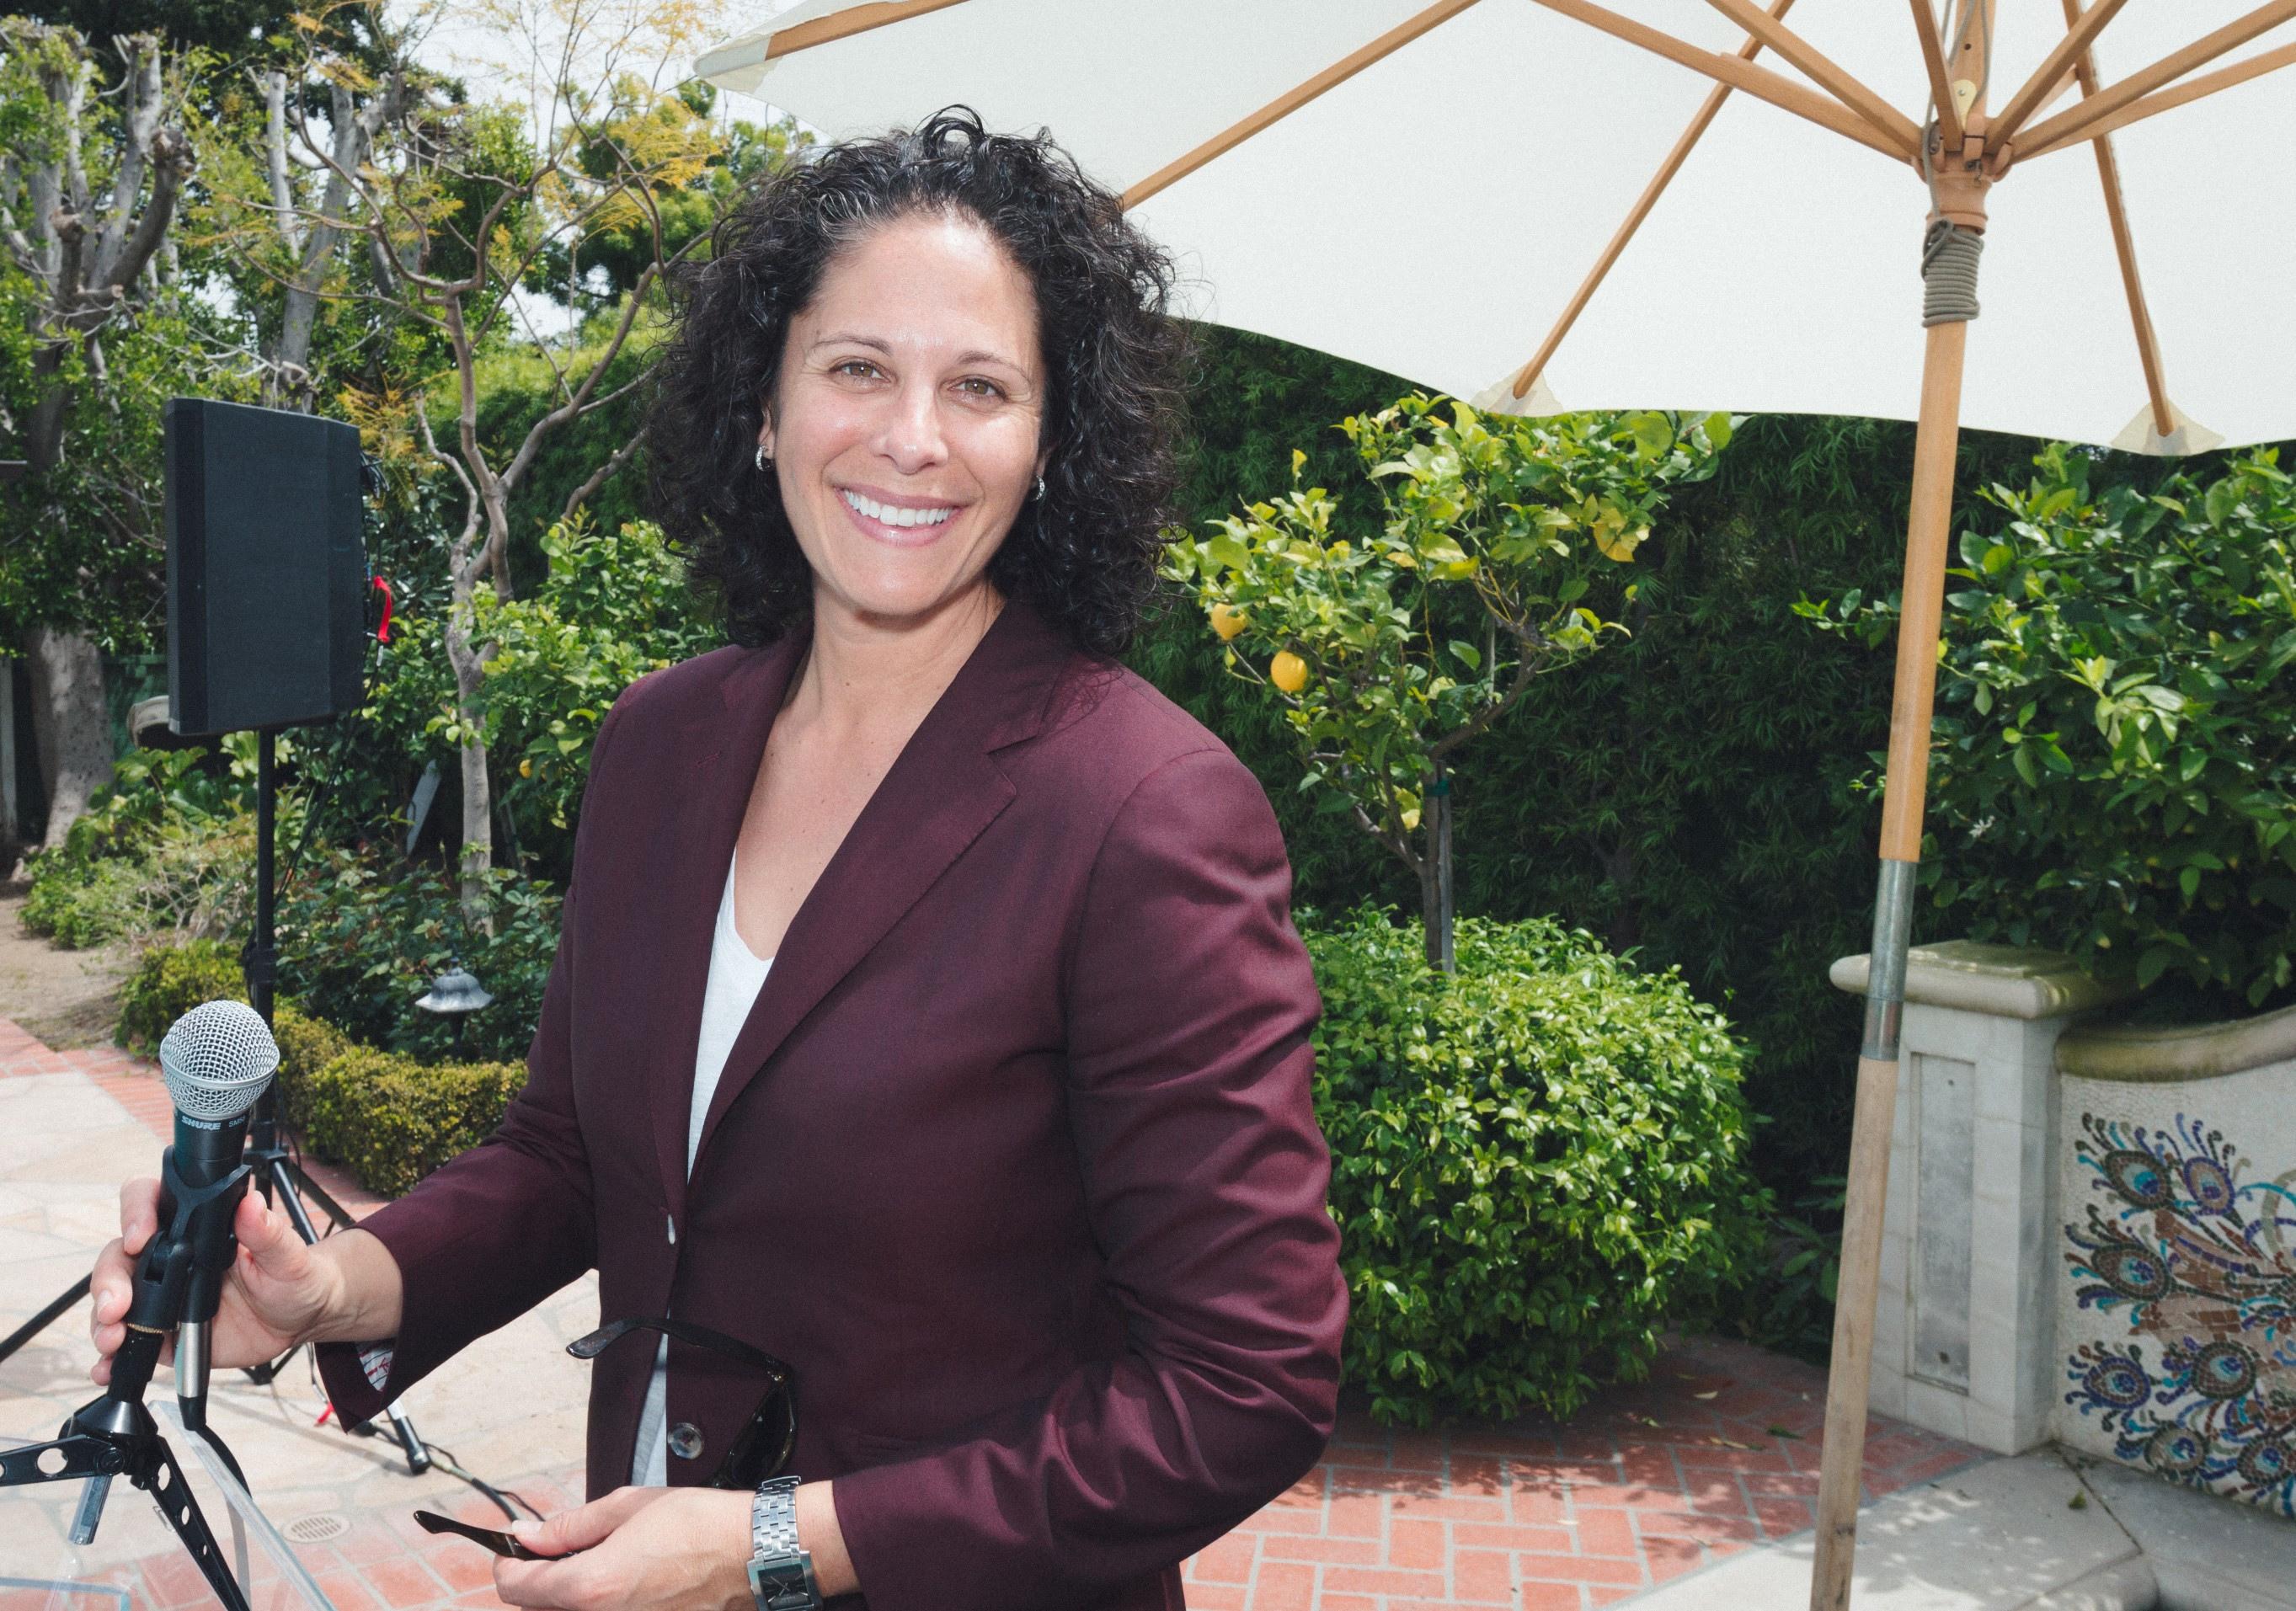 Host of the JQ 2018 Awards Garden Brunch, Dana Goldberg